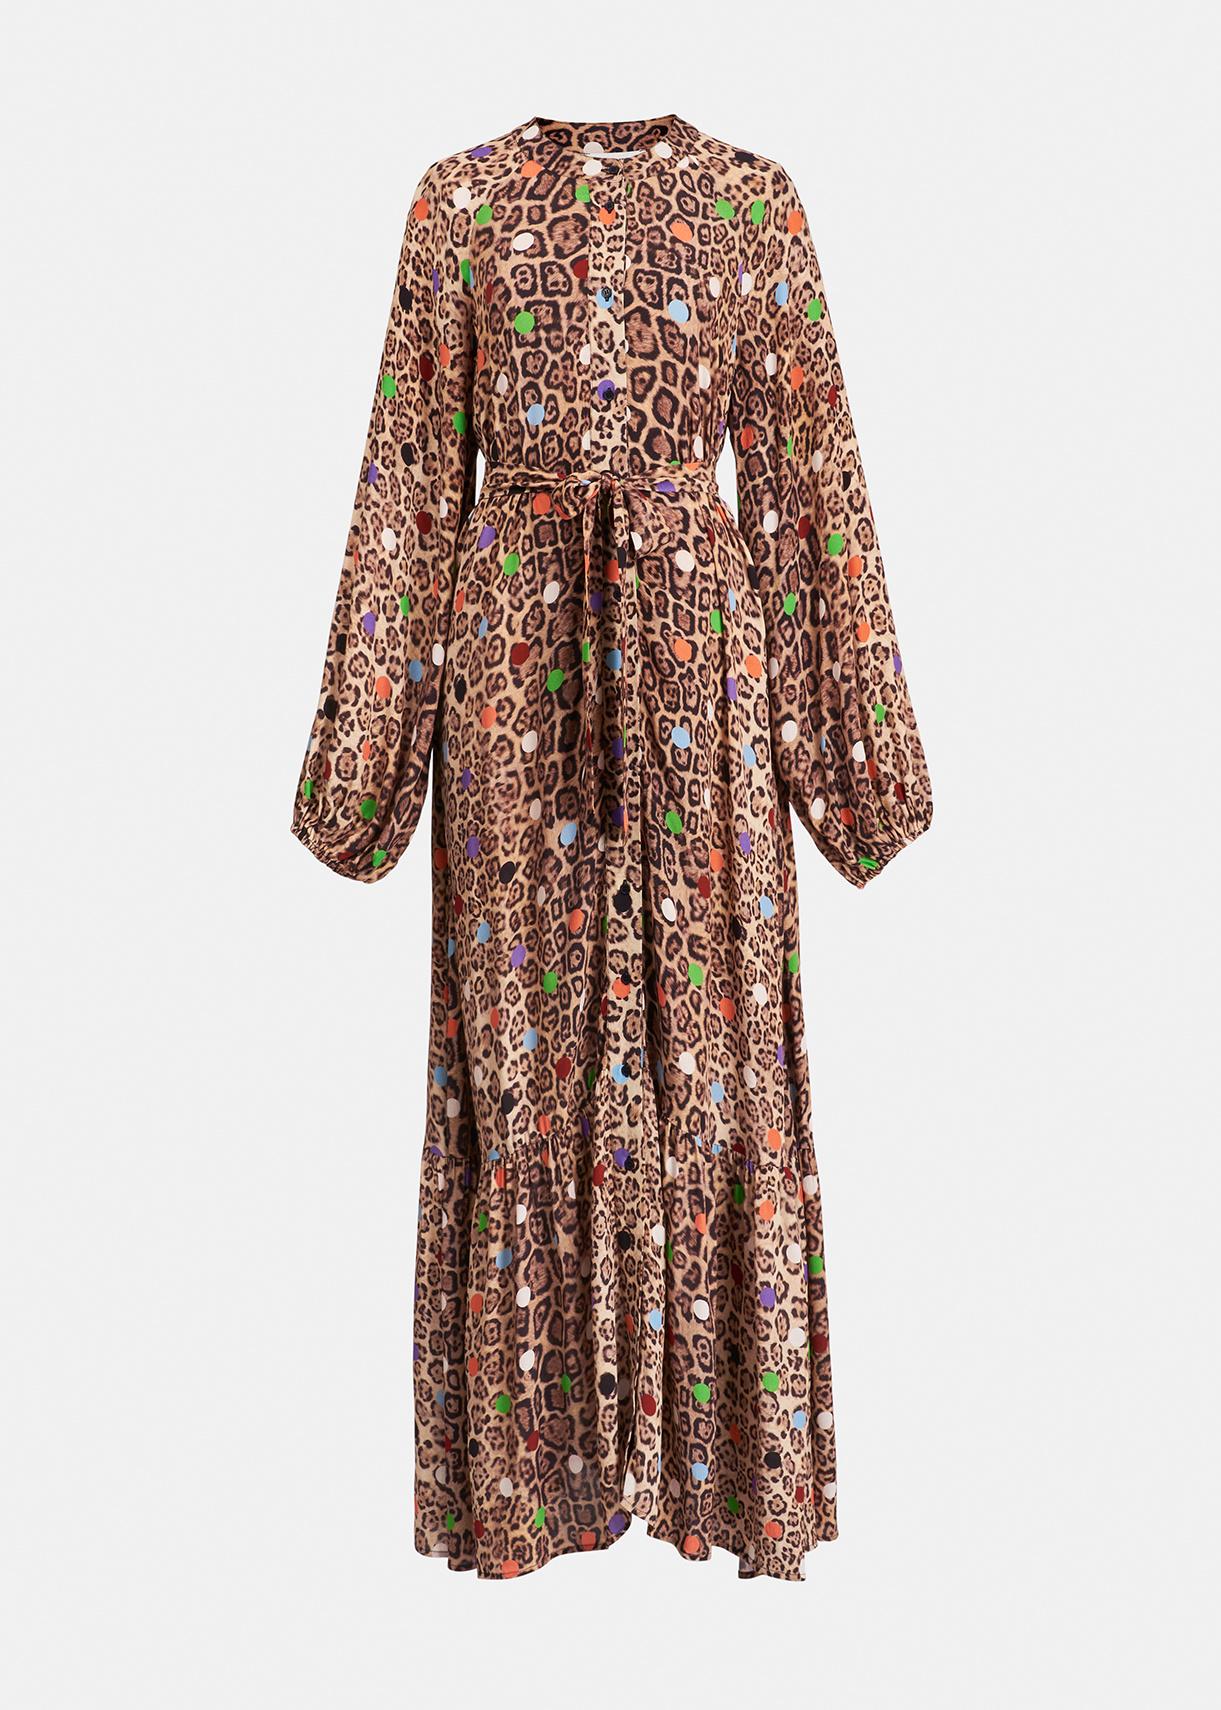 ZEBEL robe-1